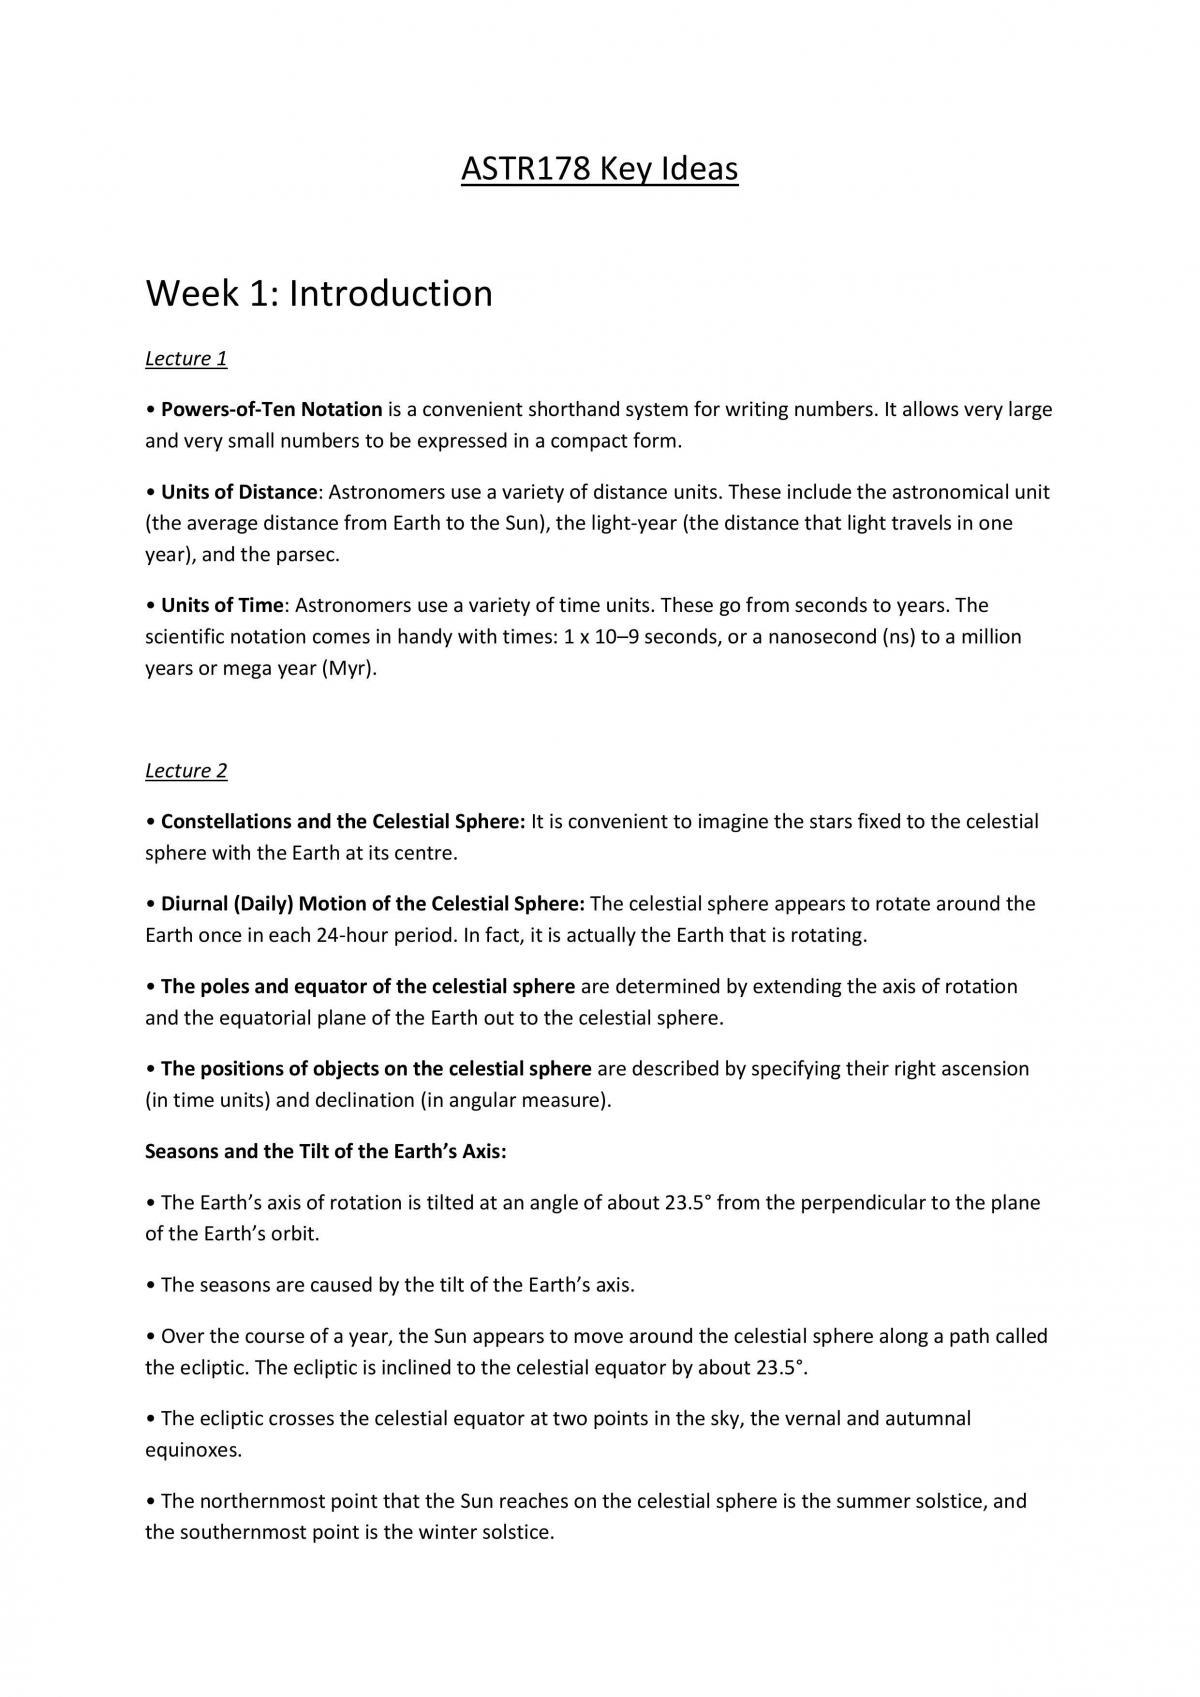 ASTR178 Key Ideas - Page 1